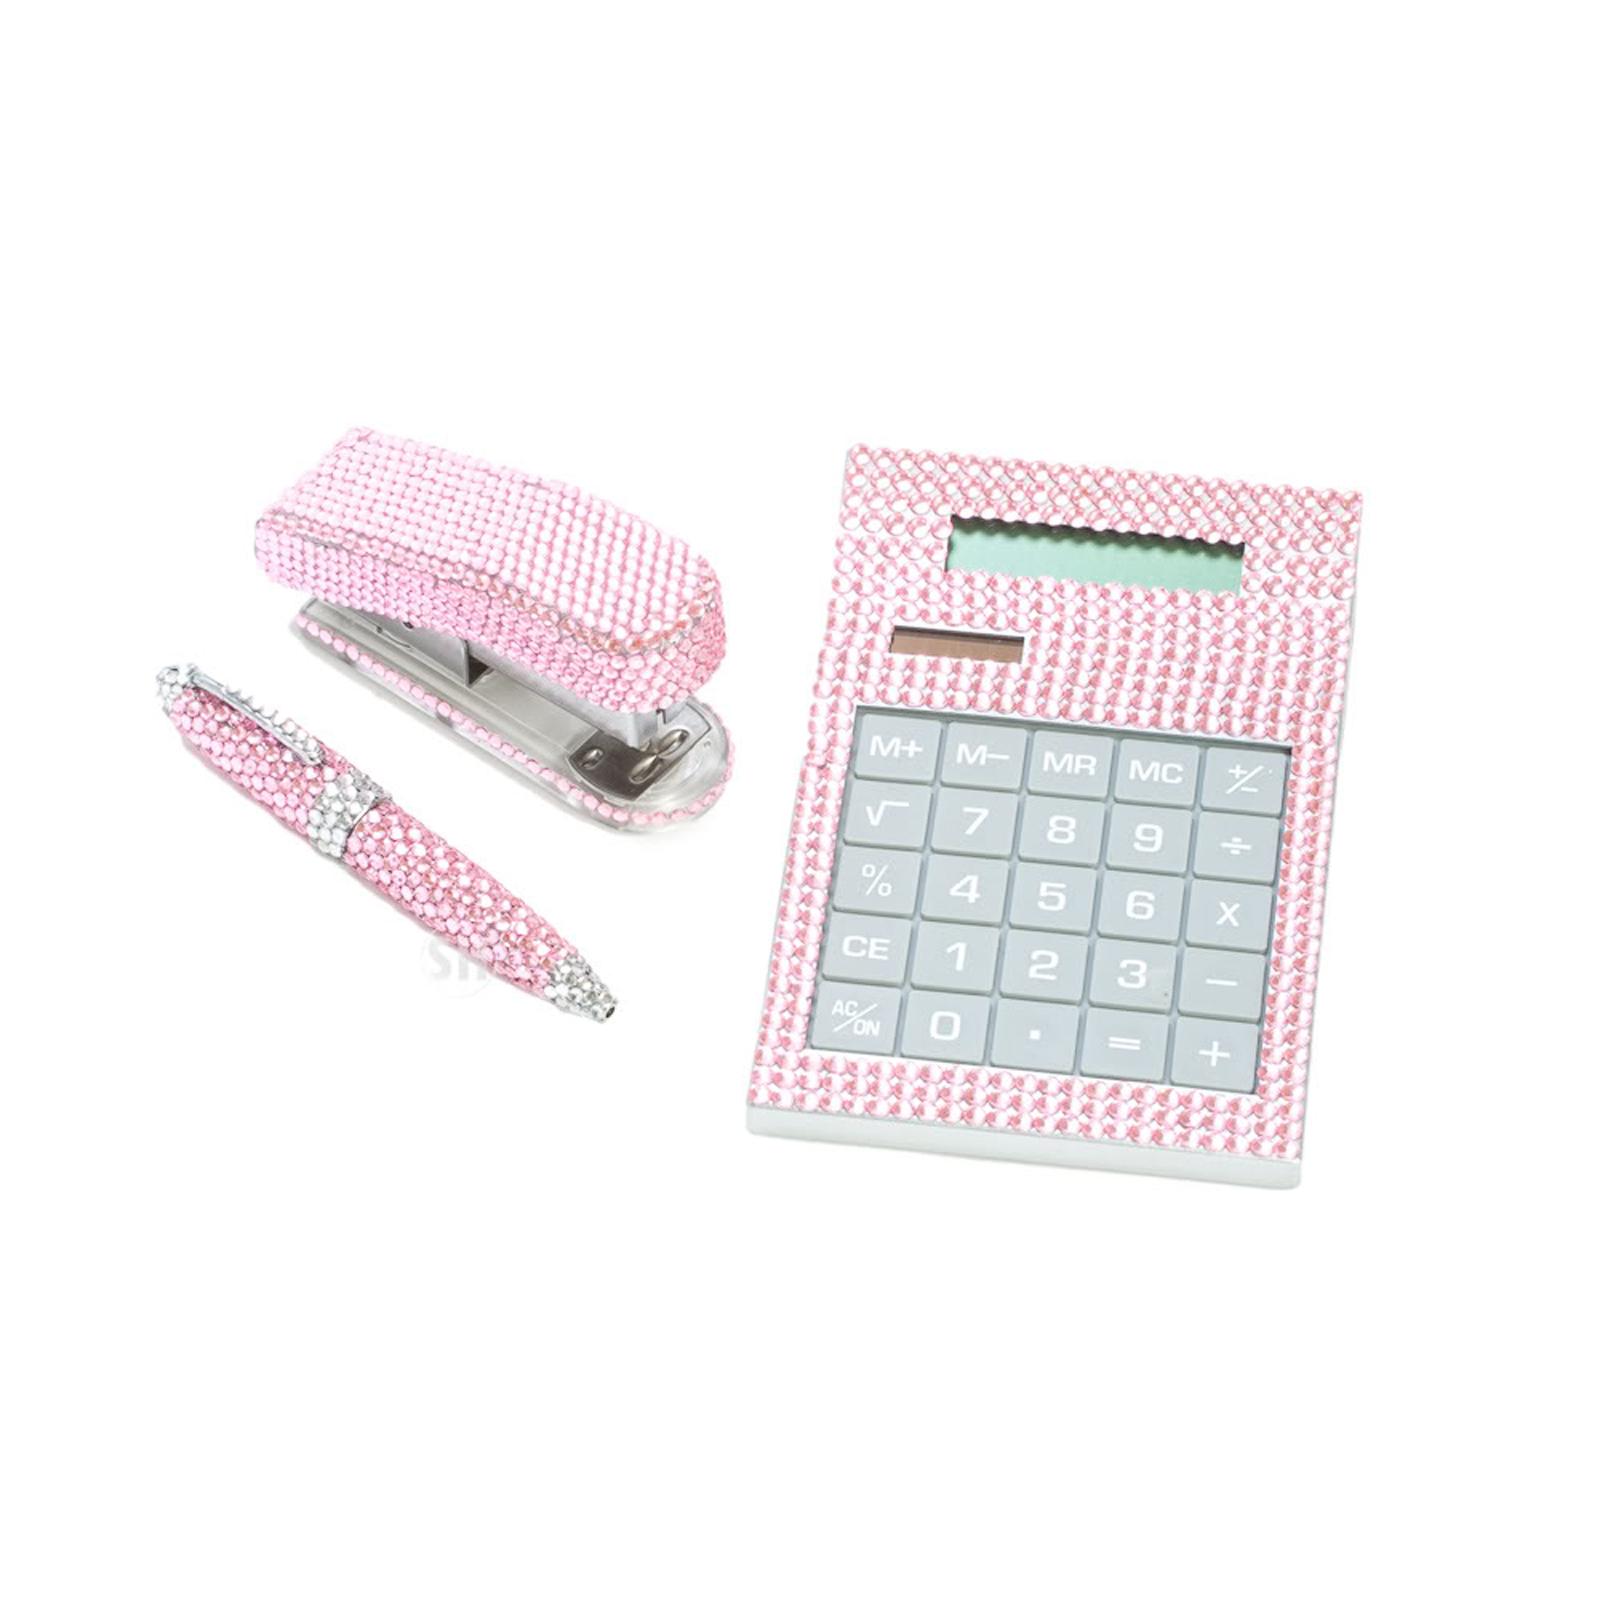 3 Piece Pink Crystal Desk fice Accessory Supply Set